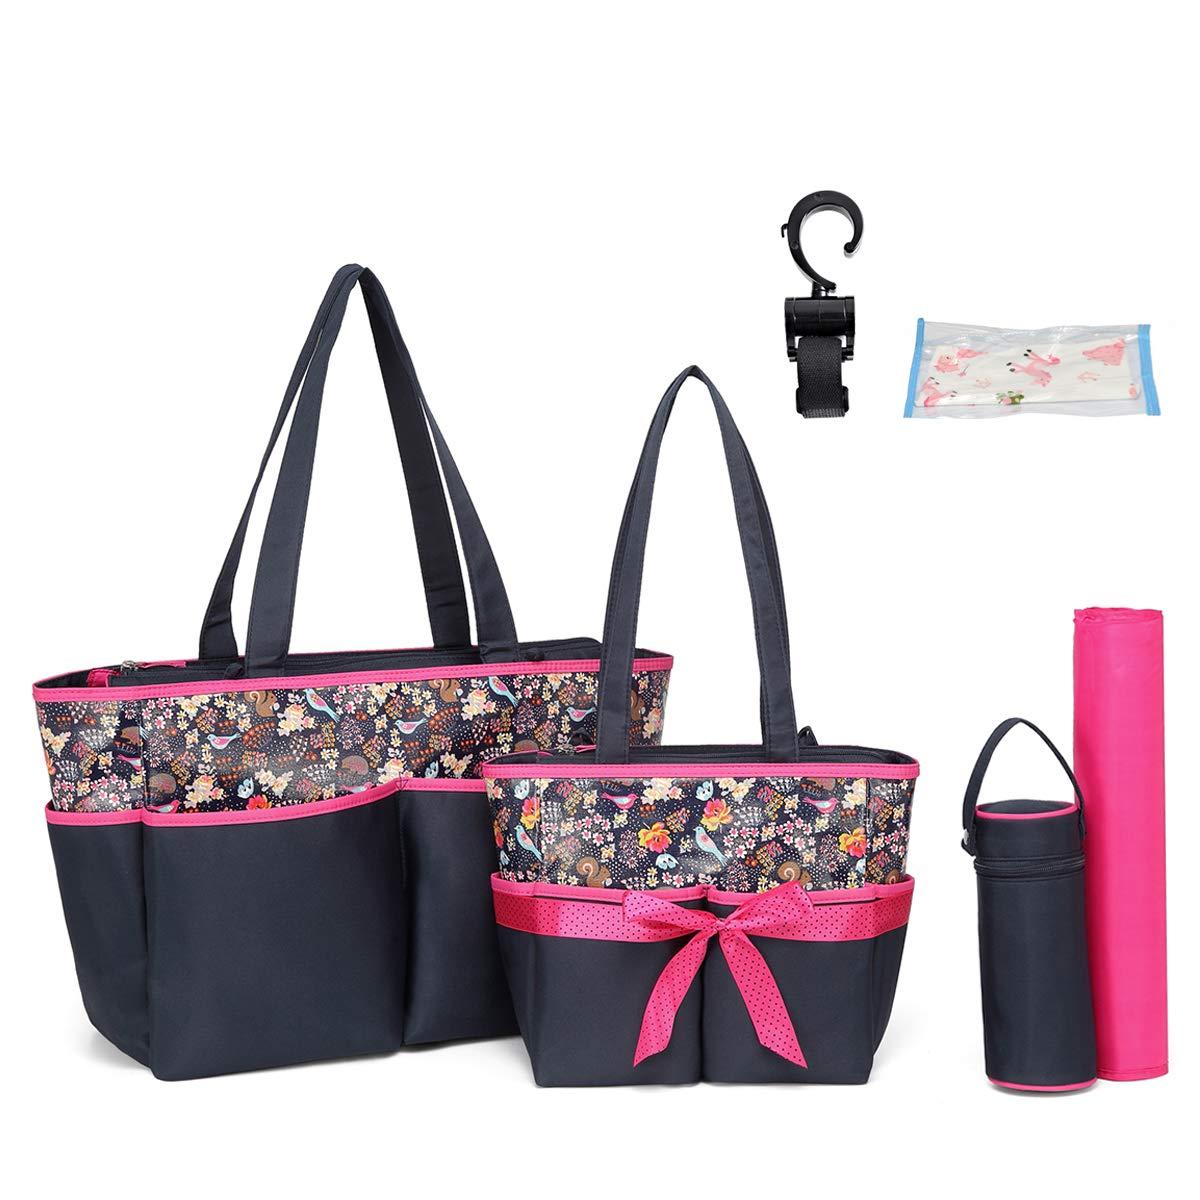 Diaper Tote Bag Diaper Bag - Nappy Bag Baby Diaper Totes for Mom Grils Unisex Maternity Nappy Bag Organizer Large Capacity Canva Tote Bag Beach Bag (Pink)